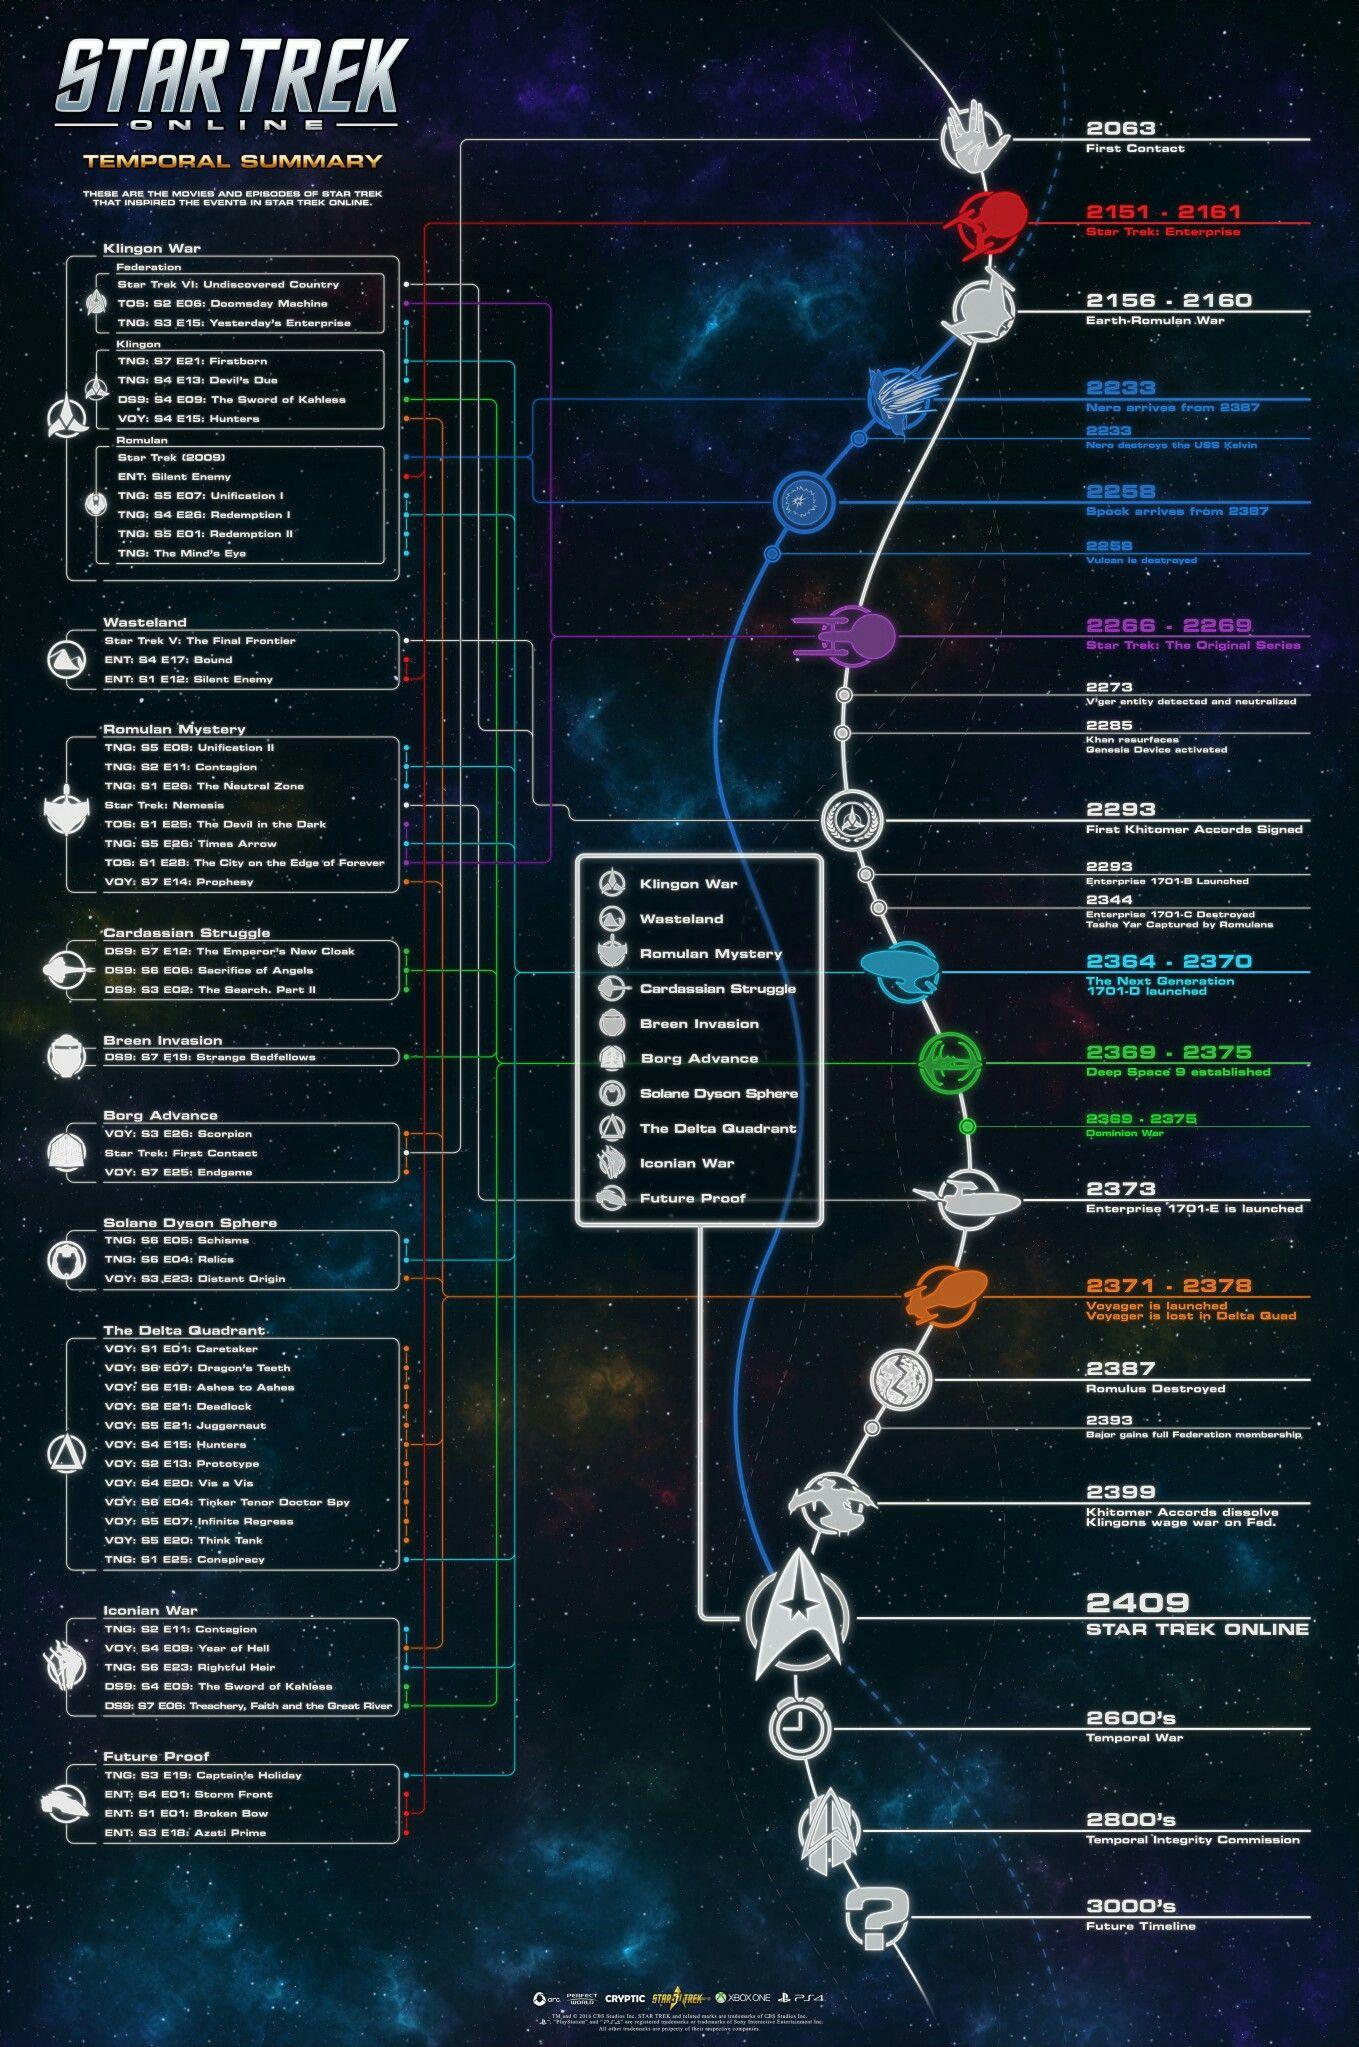 Star Trek Online timeline   Geekery   Pinterest